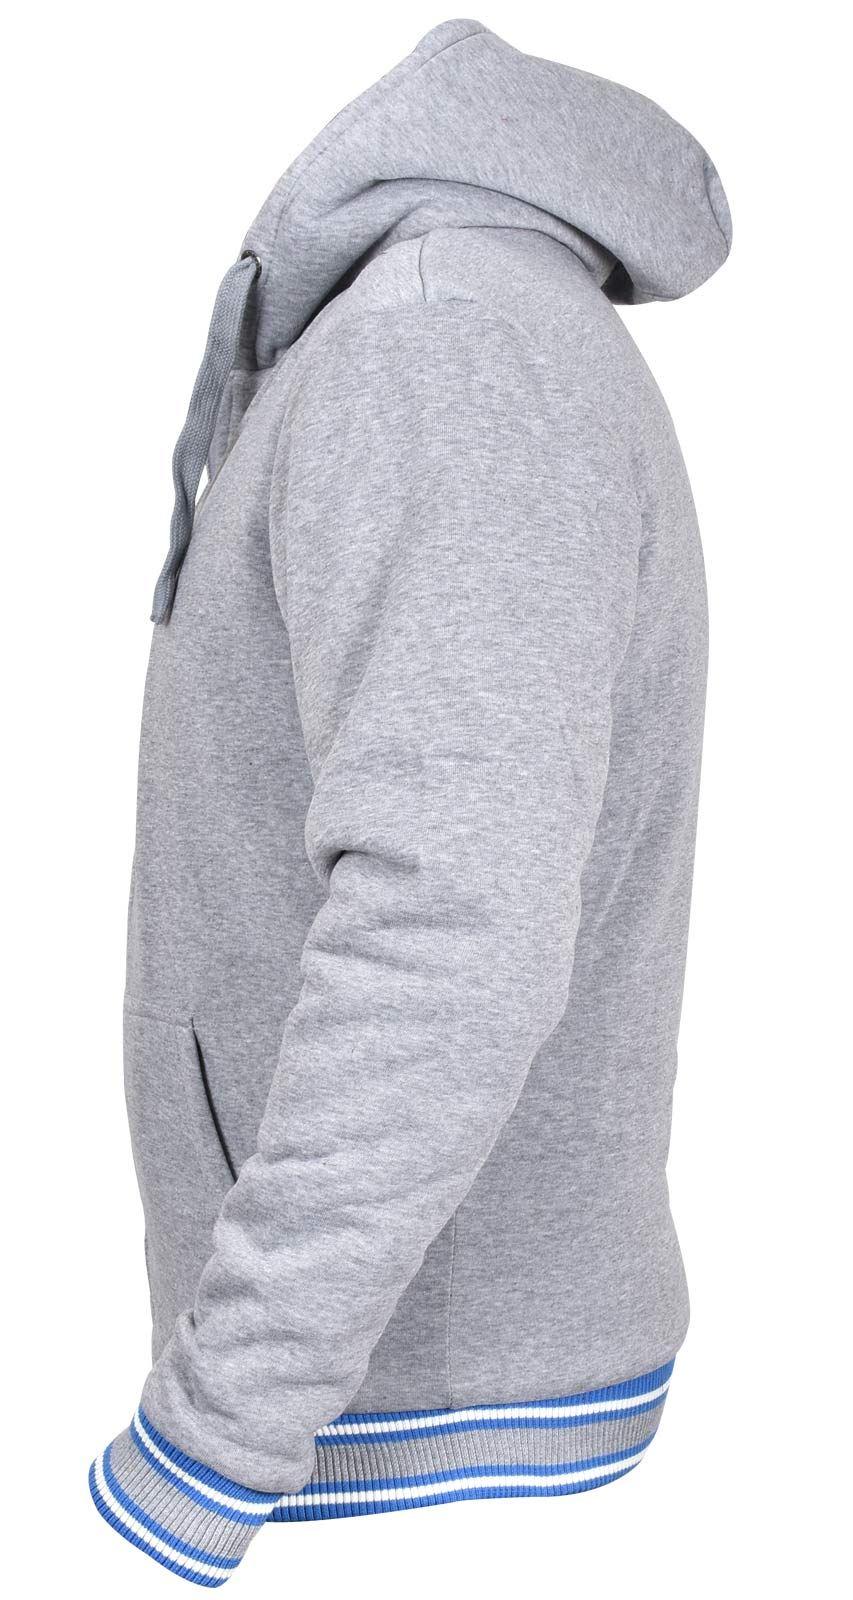 Mens Full Zip Hoodie Zone Sherpa Thick Fleece Lined Zip Up Hooded Sweater